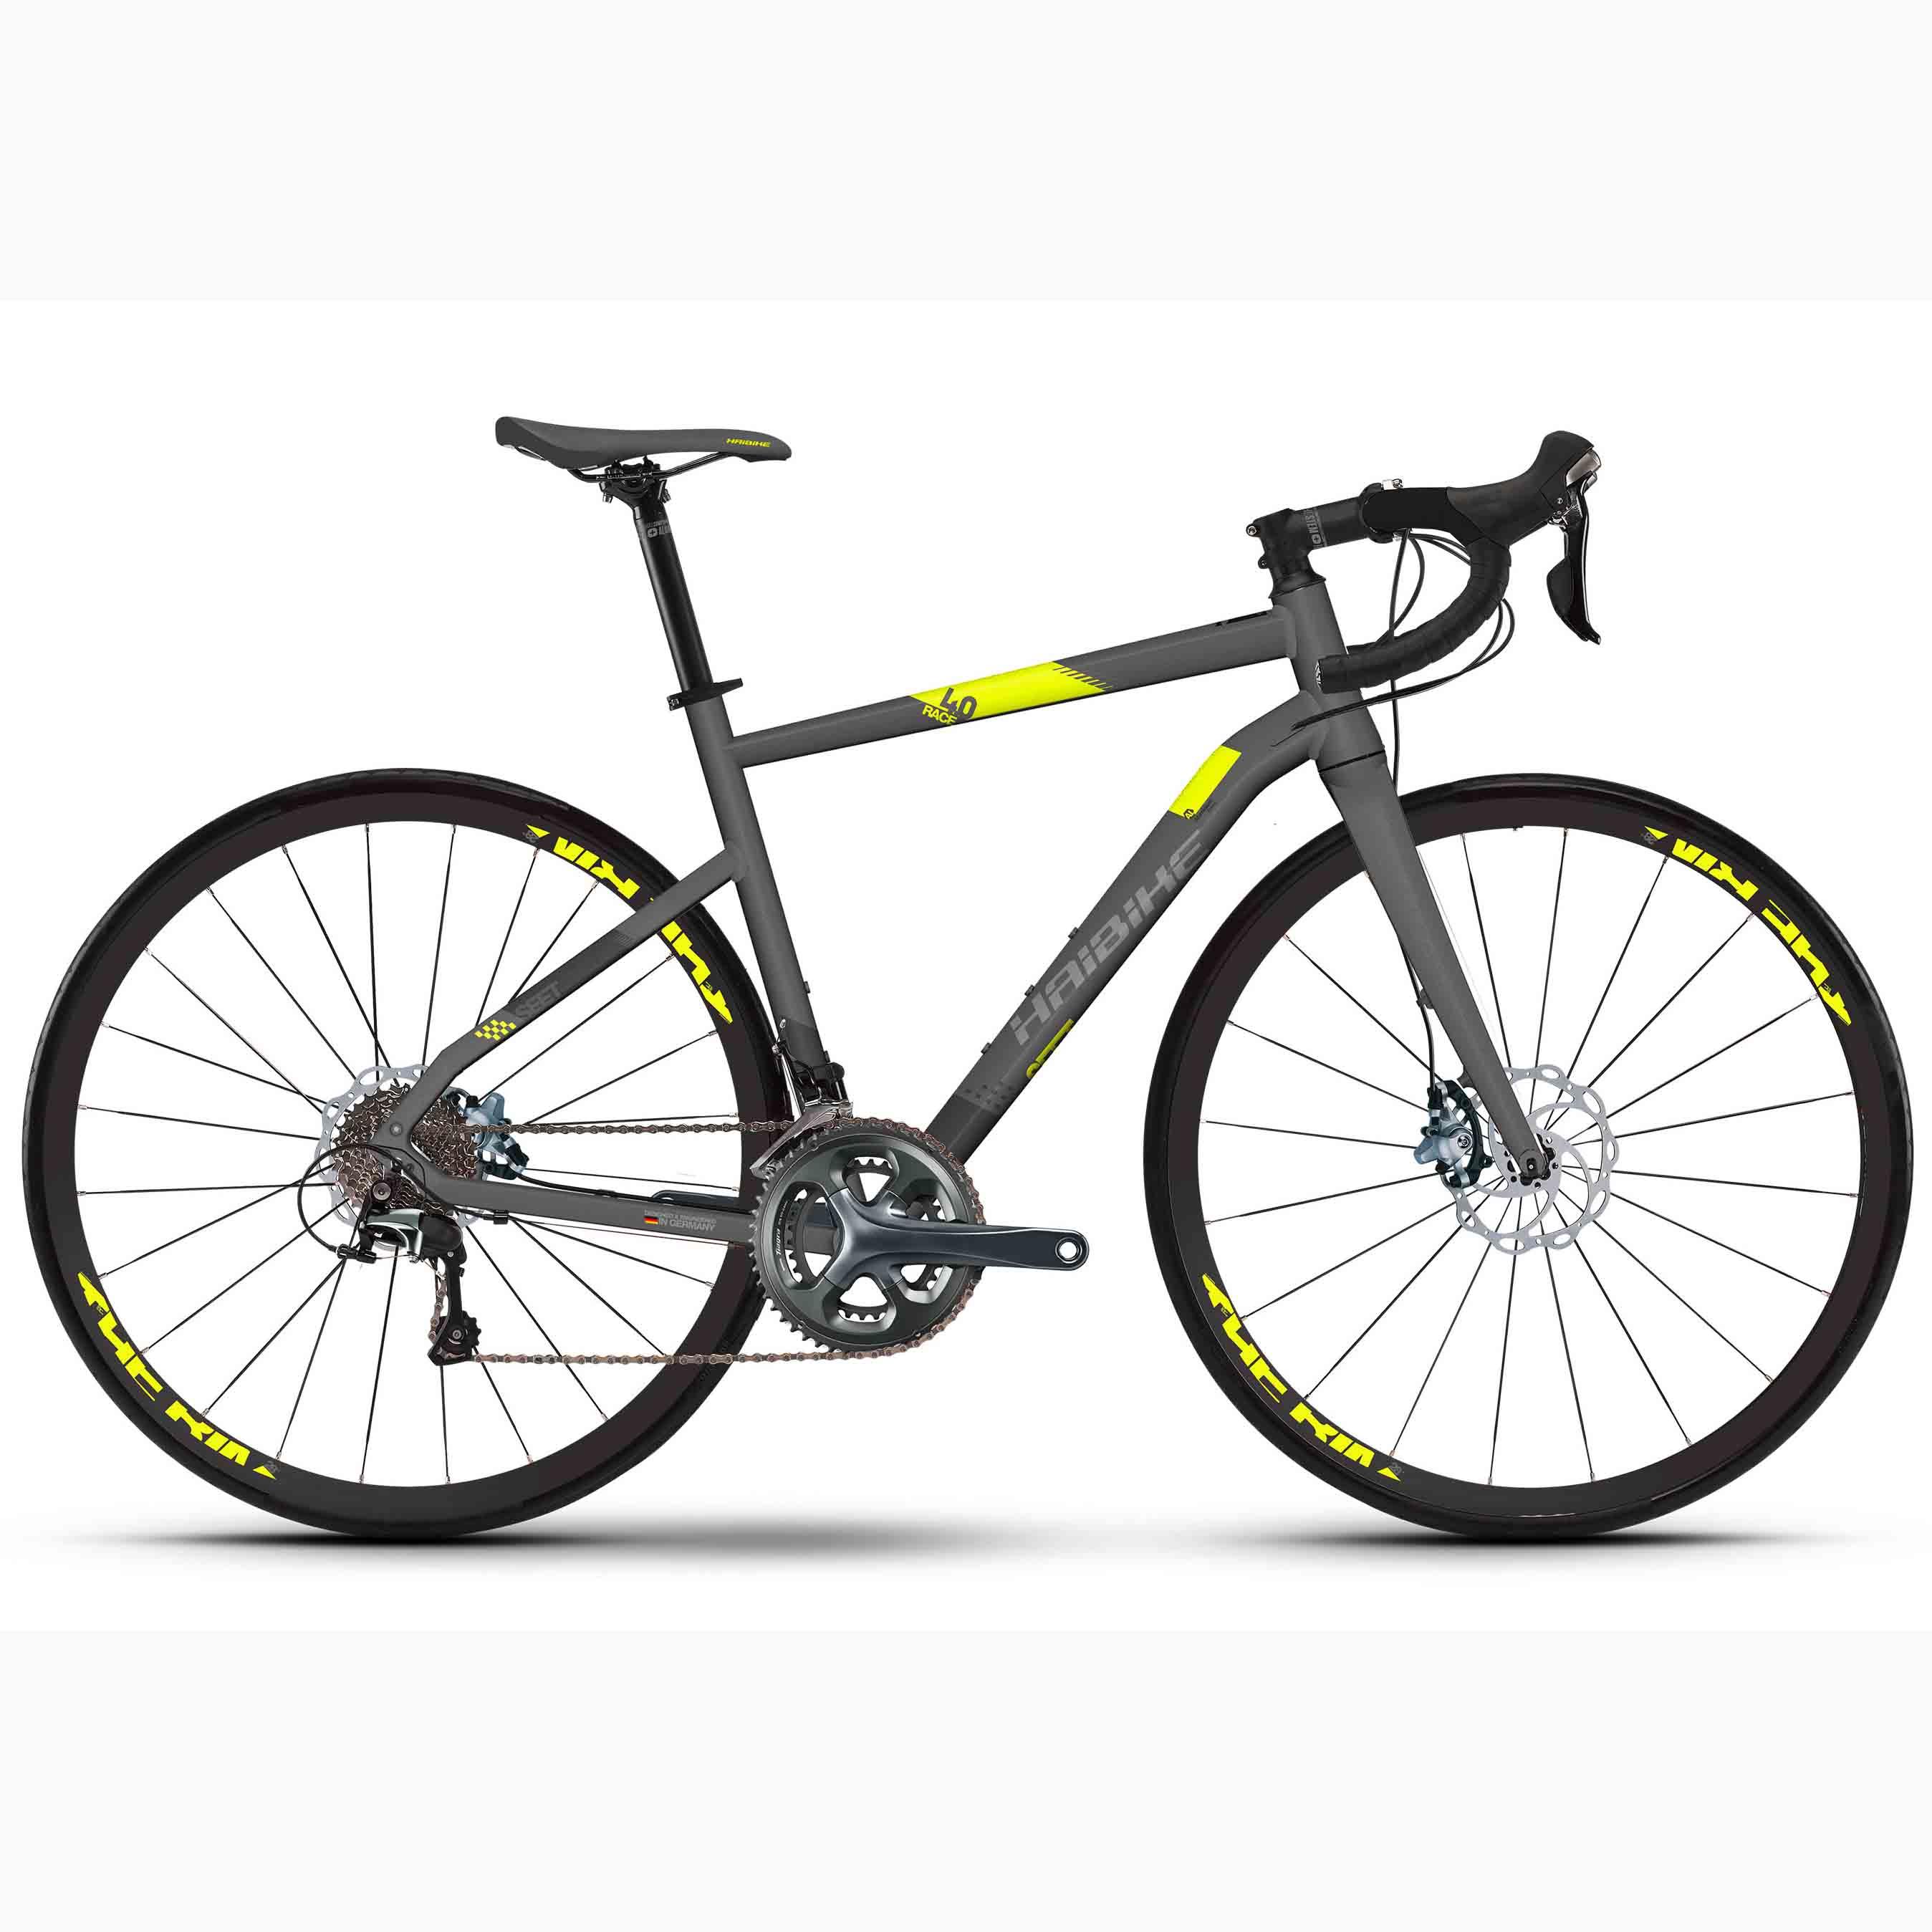 Фото Велосипед Haibike SEET Race 4.0 28″, рама 53см, 2018